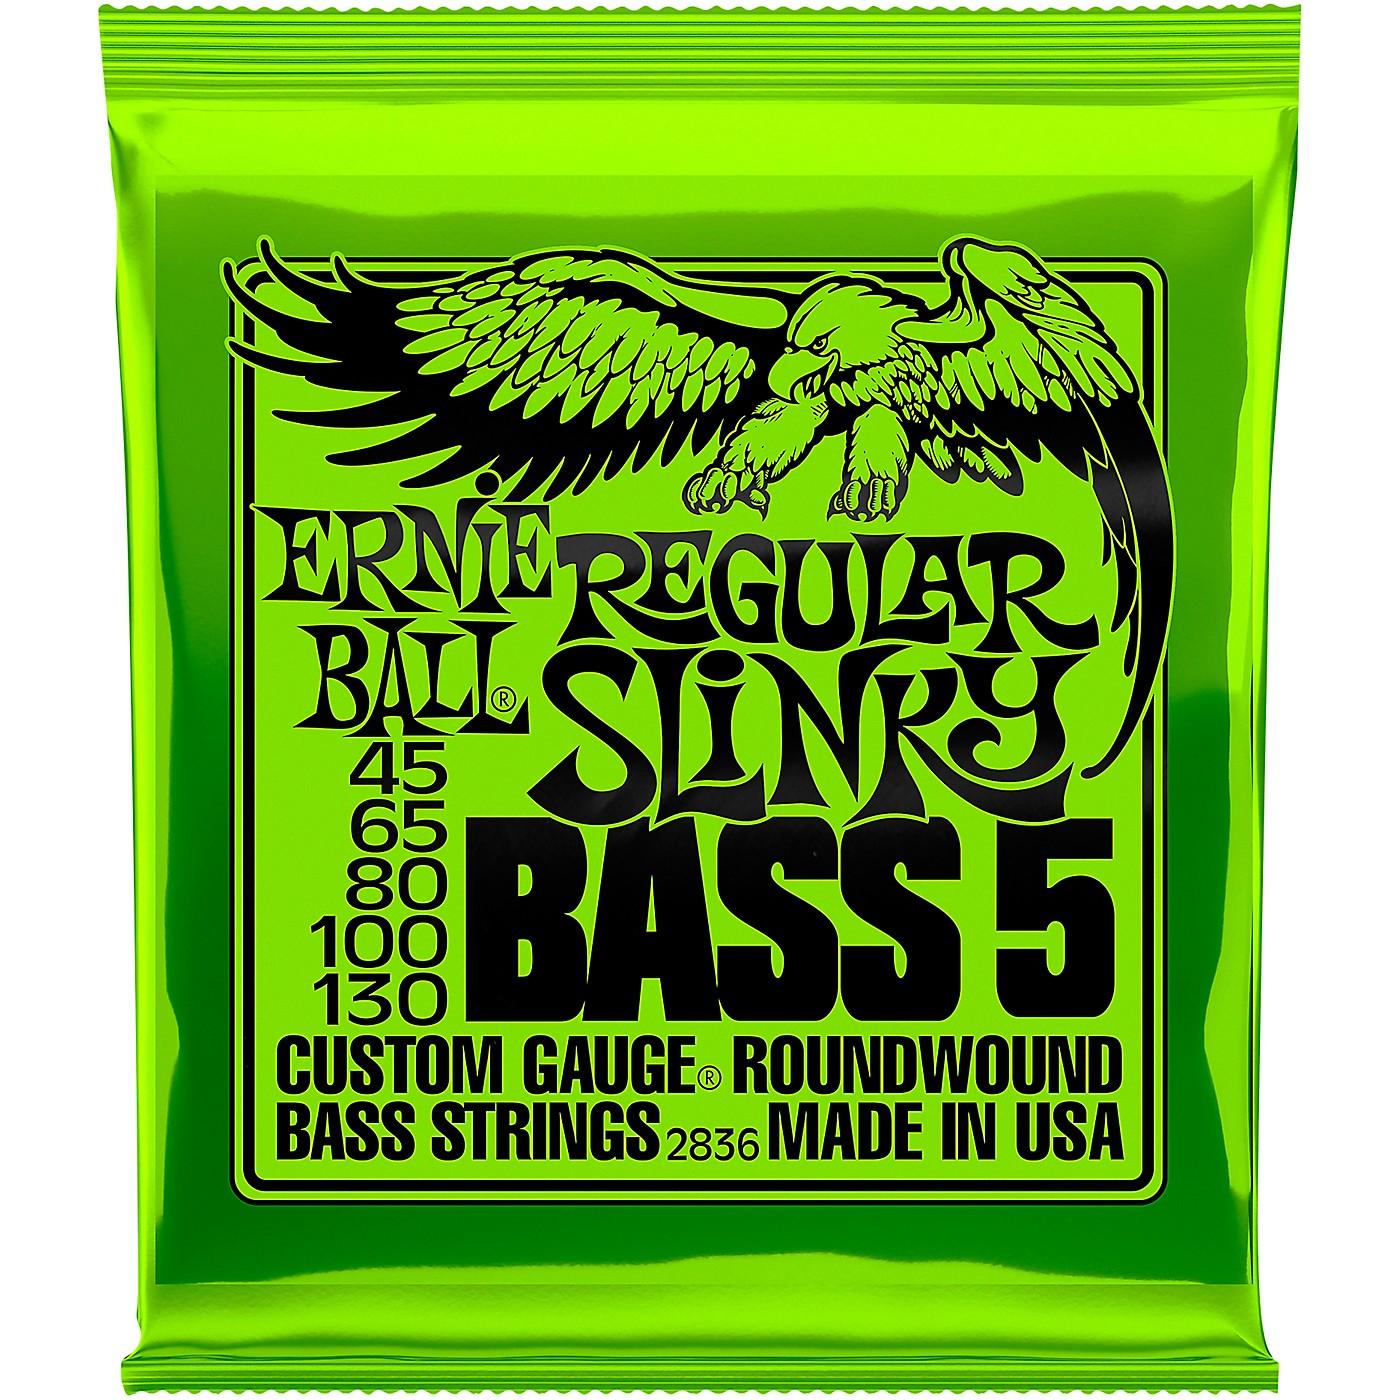 Ernie Ball 2836 Slinky 5-String Bass Strings thumbnail